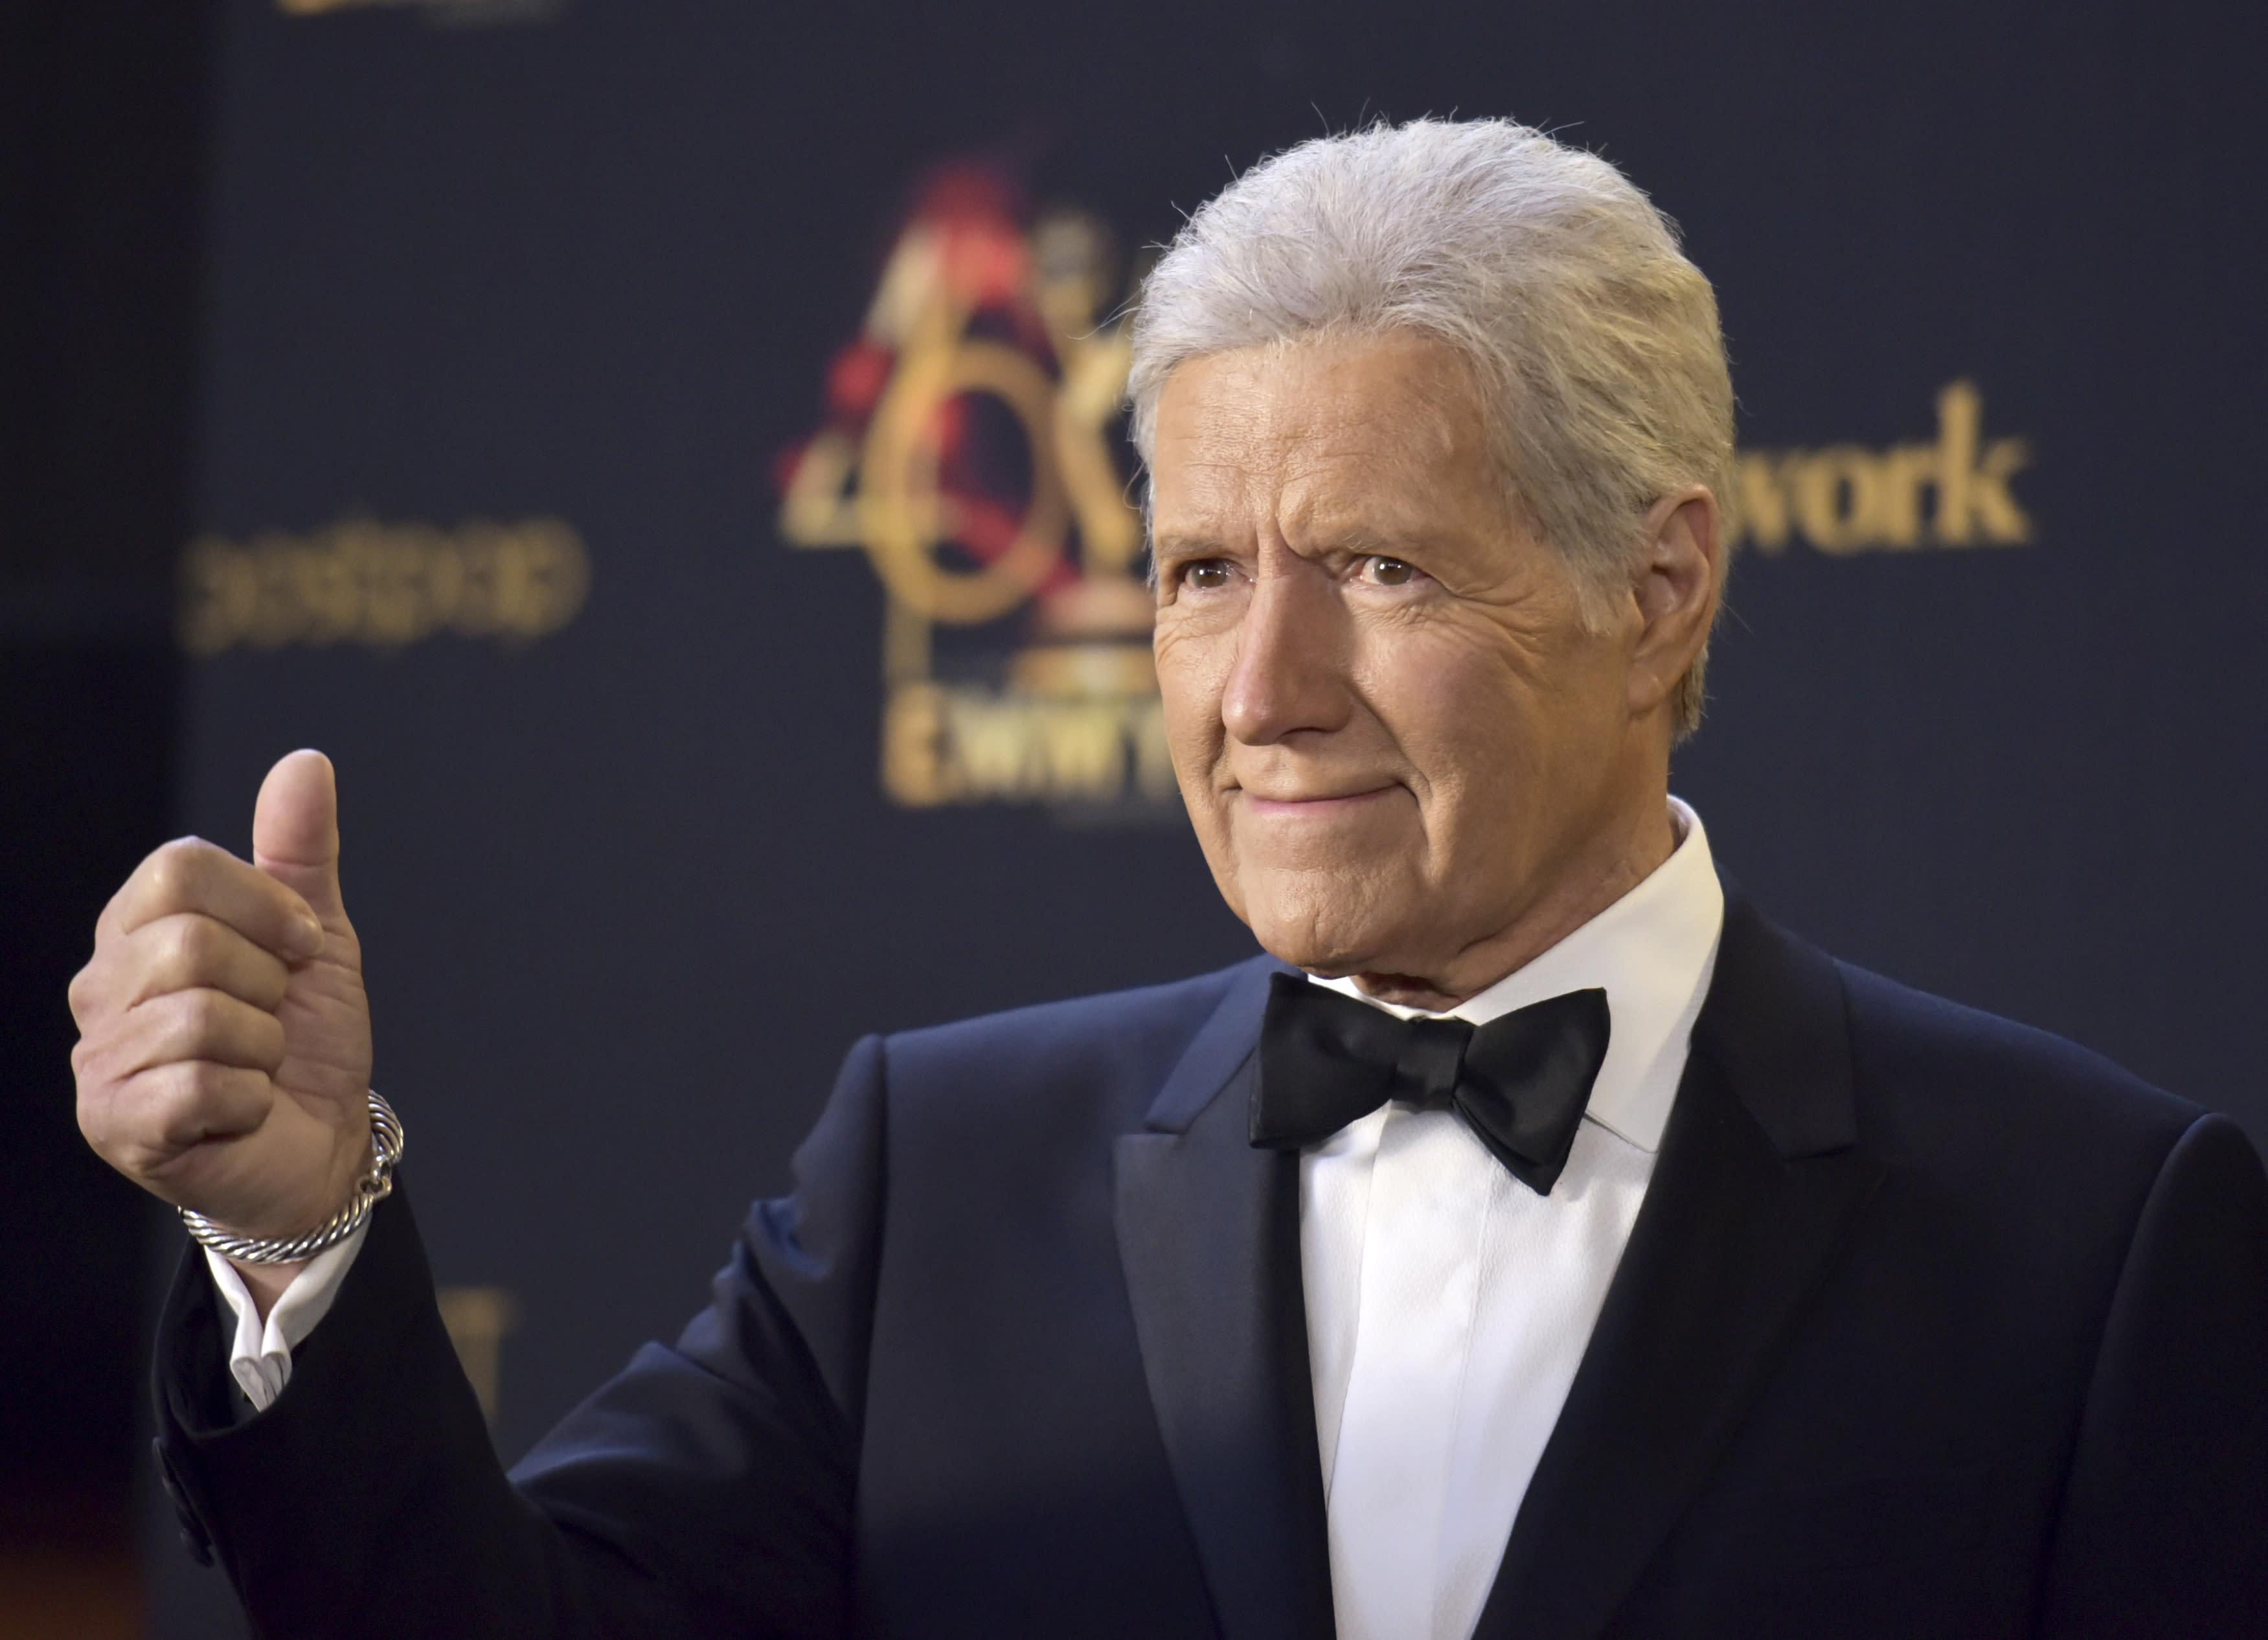 46th Annual Daytime Emmy Awards - Press Room